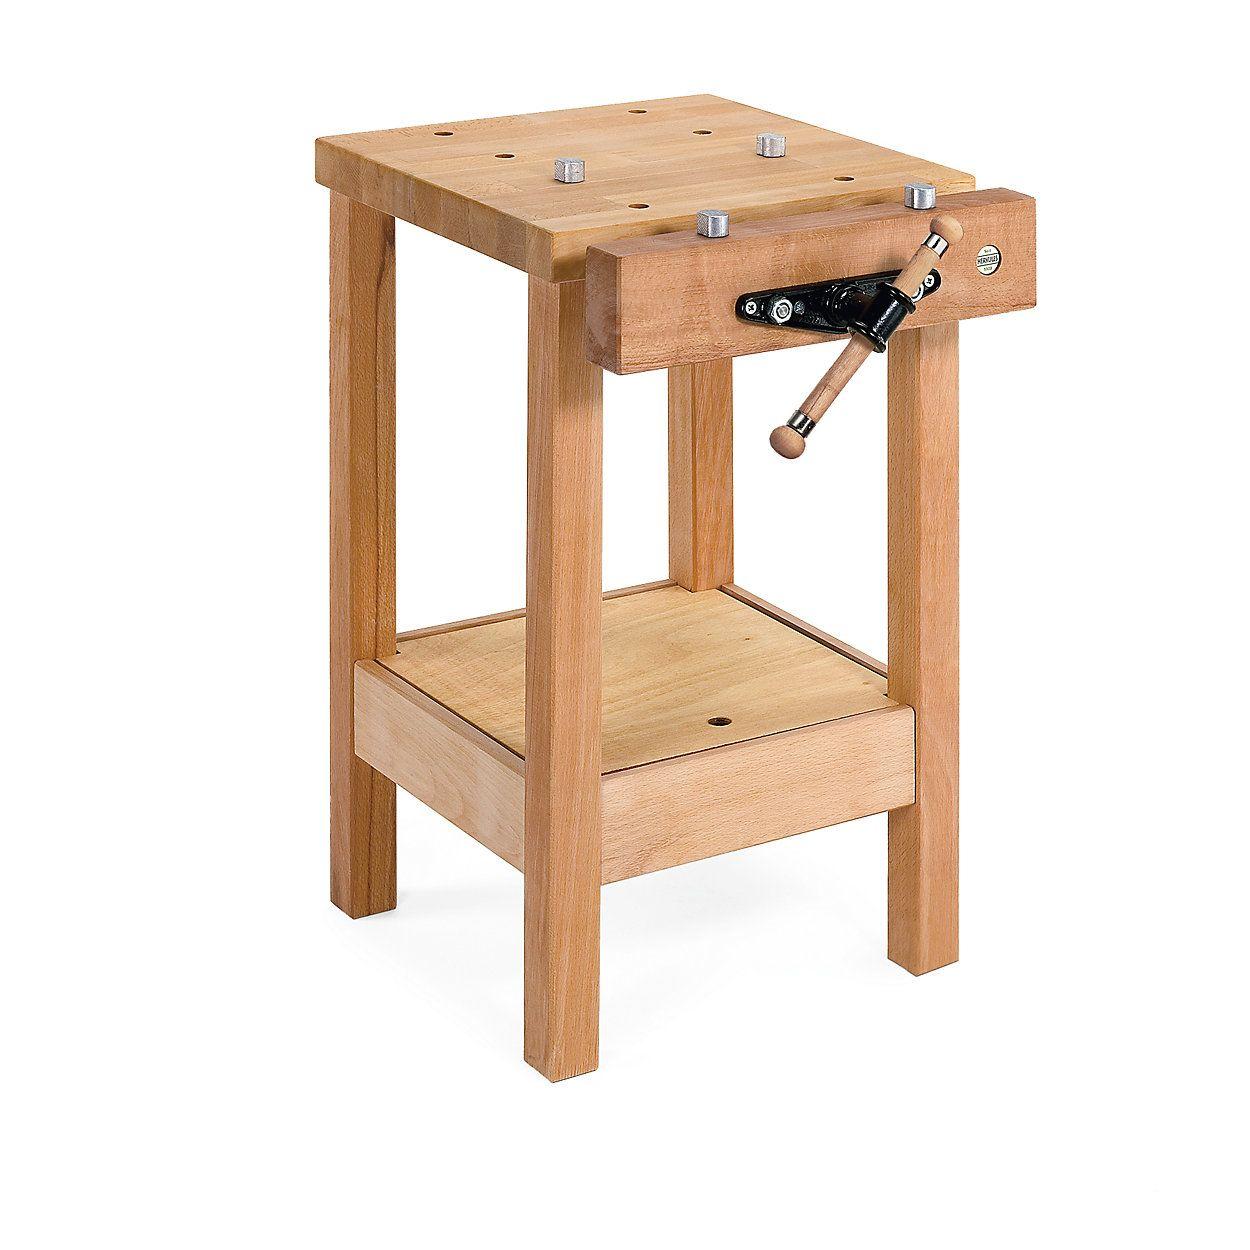 Hobelbank Buchenholz In 2020 Small Workbench Woodworking Bench Plans Diy Pallet Furniture